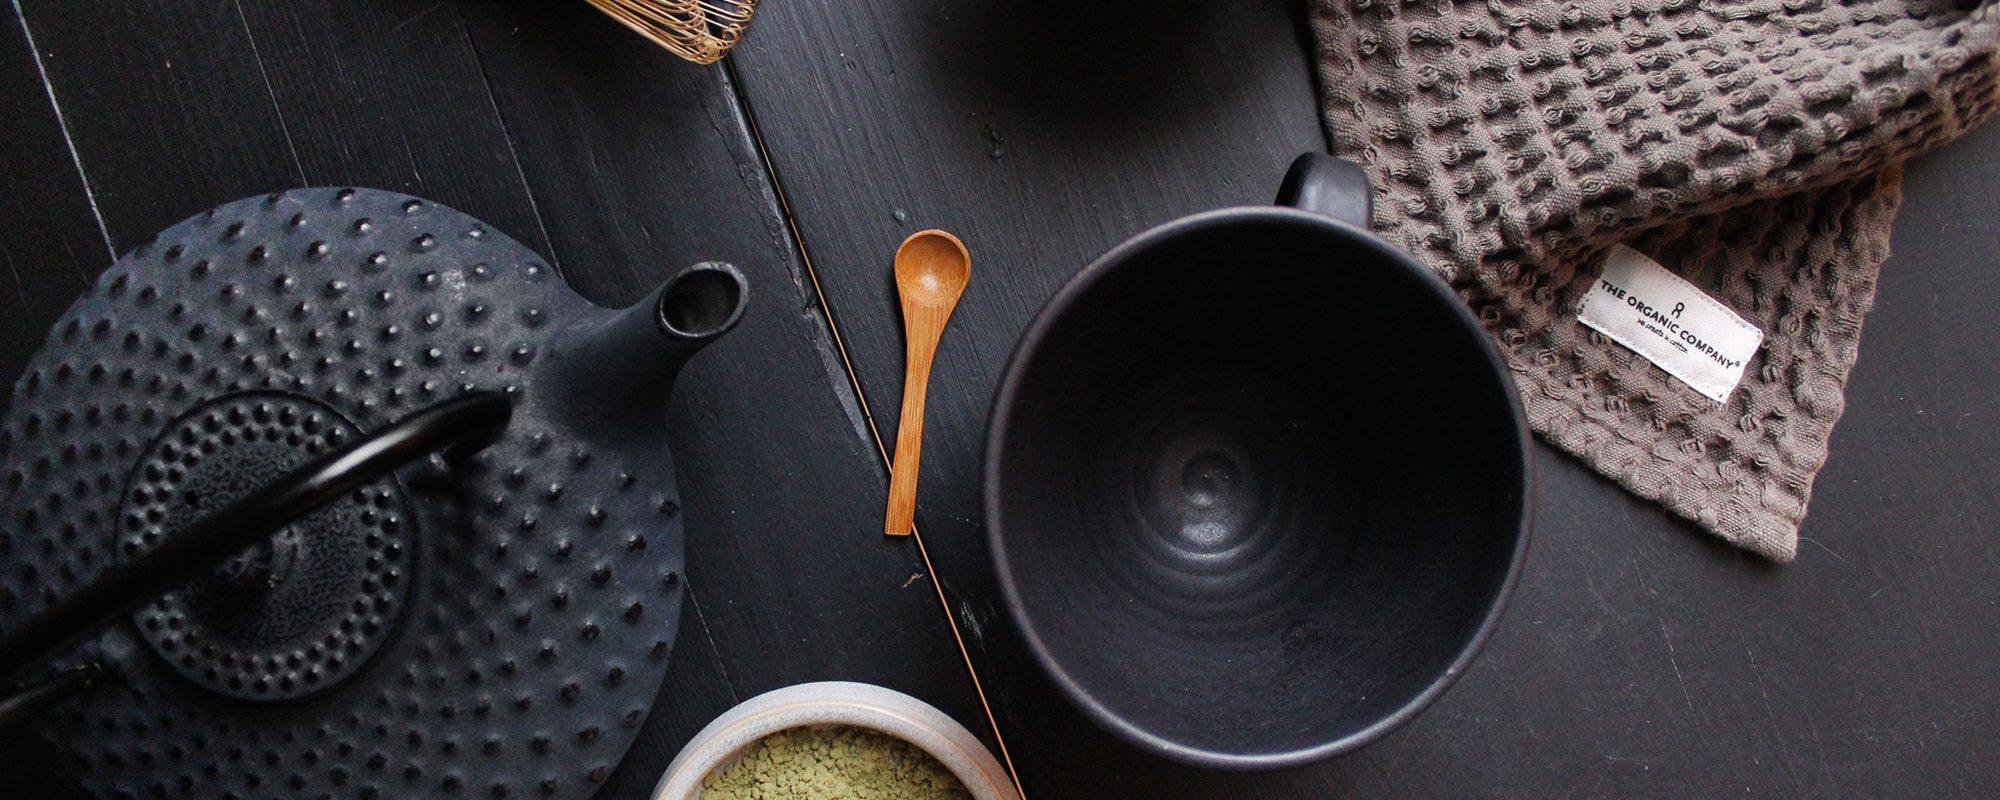 KitchenWashCloth clay kitchen - TheOrganicCompany